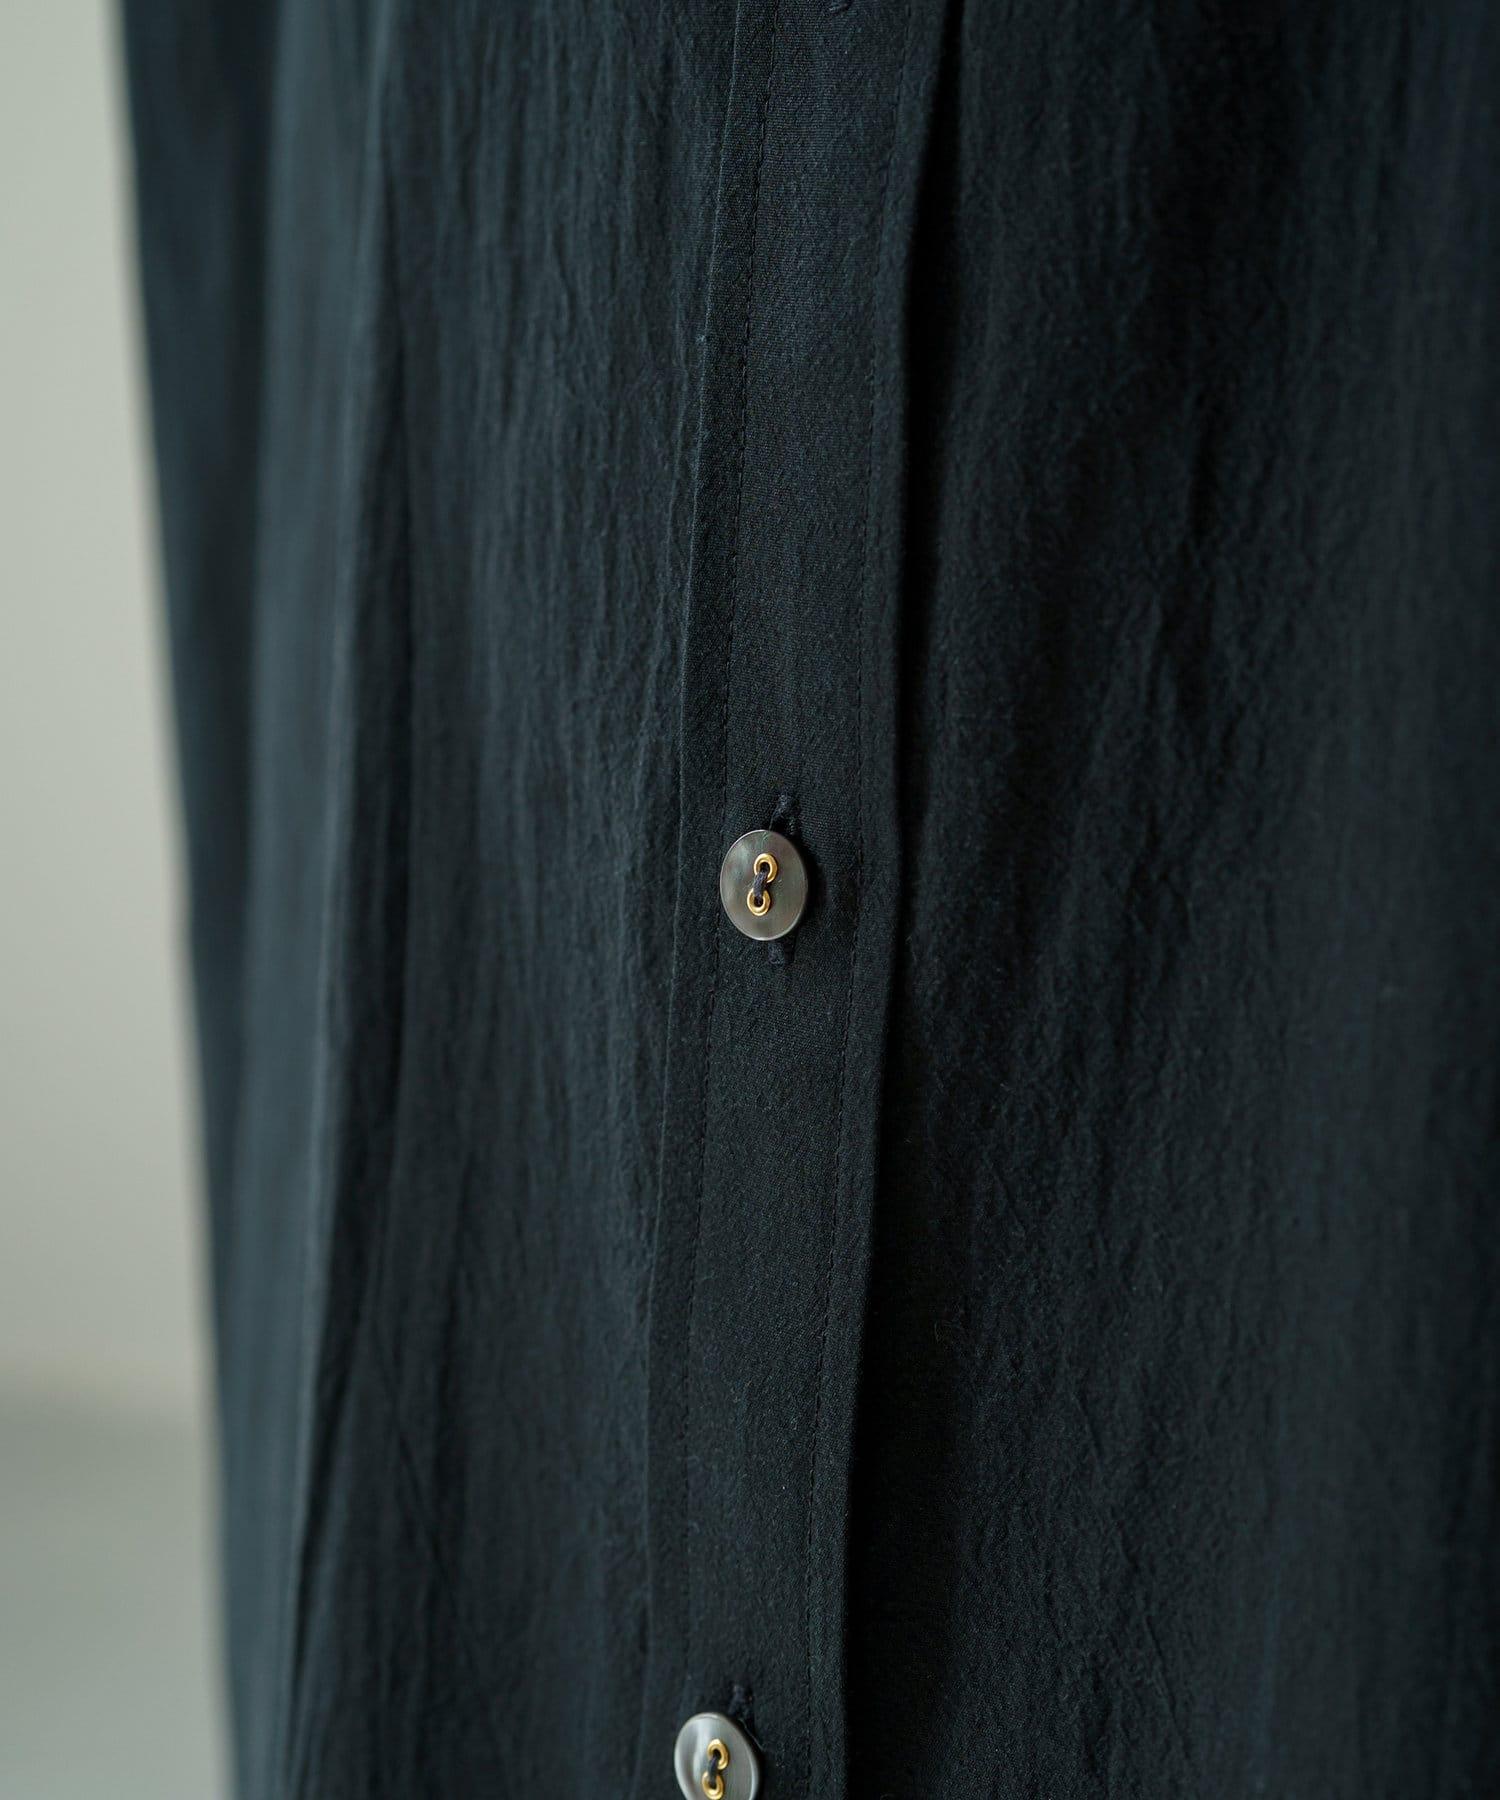 Loungedress(ラウンジドレス) オーバーシャツ